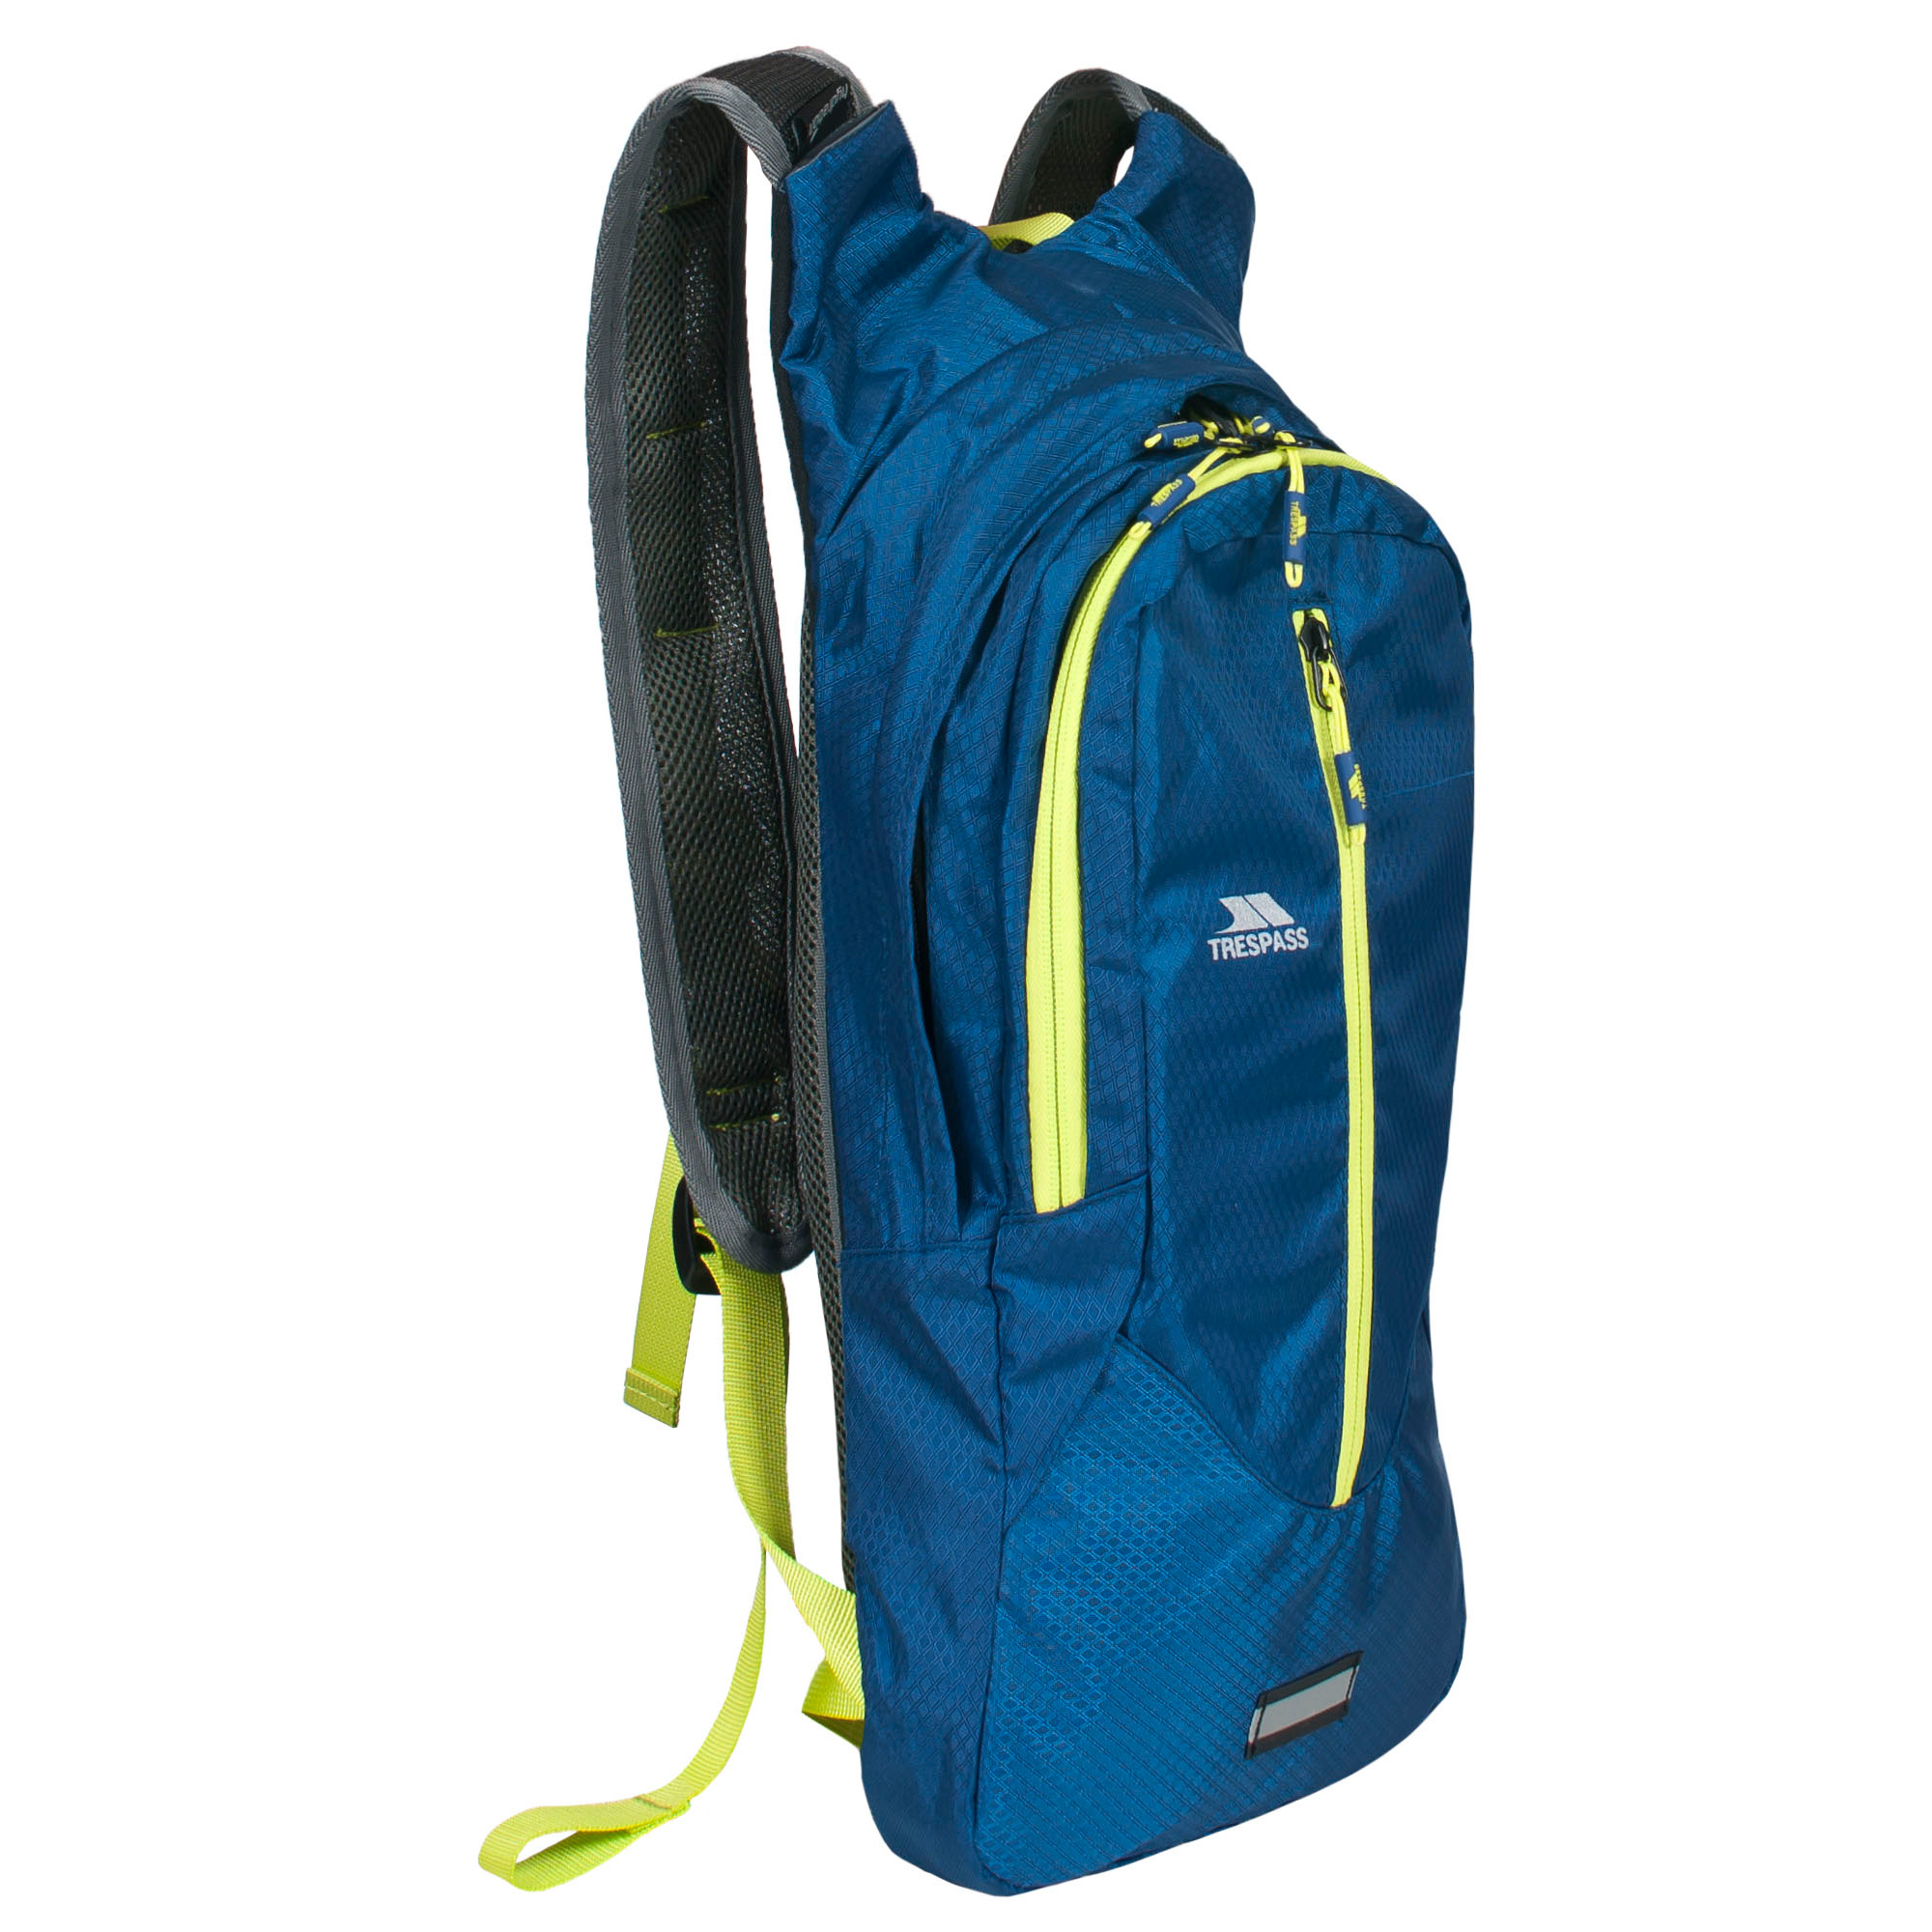 Trespass Cizzy Hydration Running Backpack